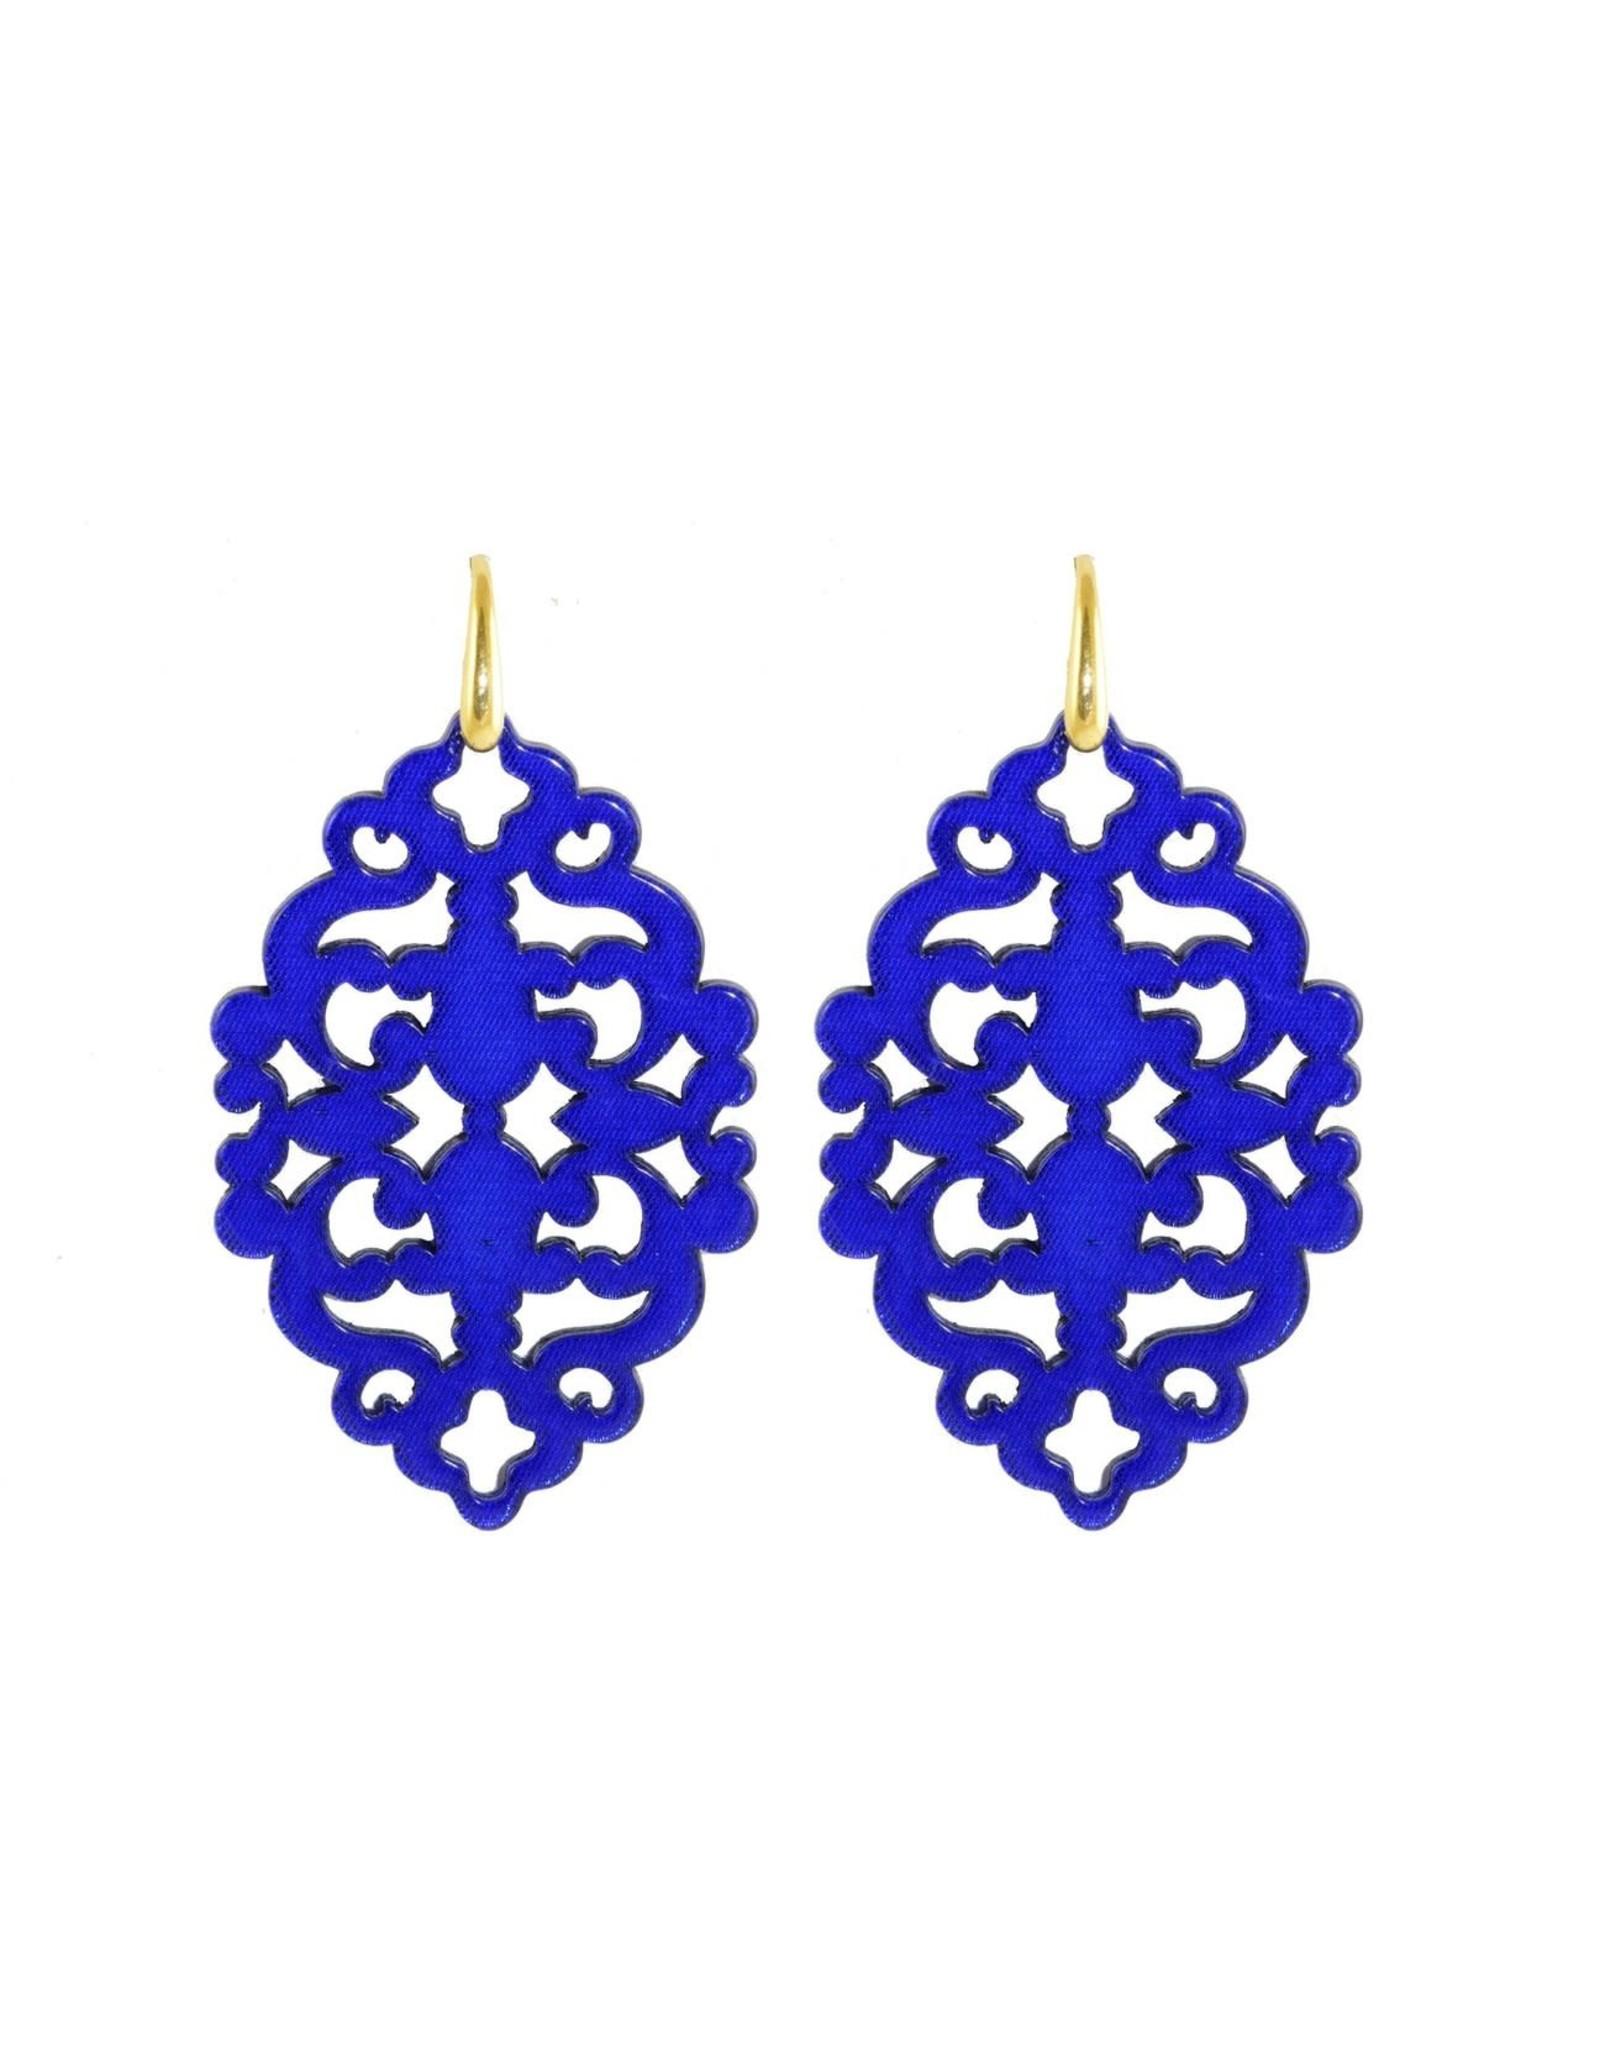 Miccy's Royal blue Oorbellen Miccy's